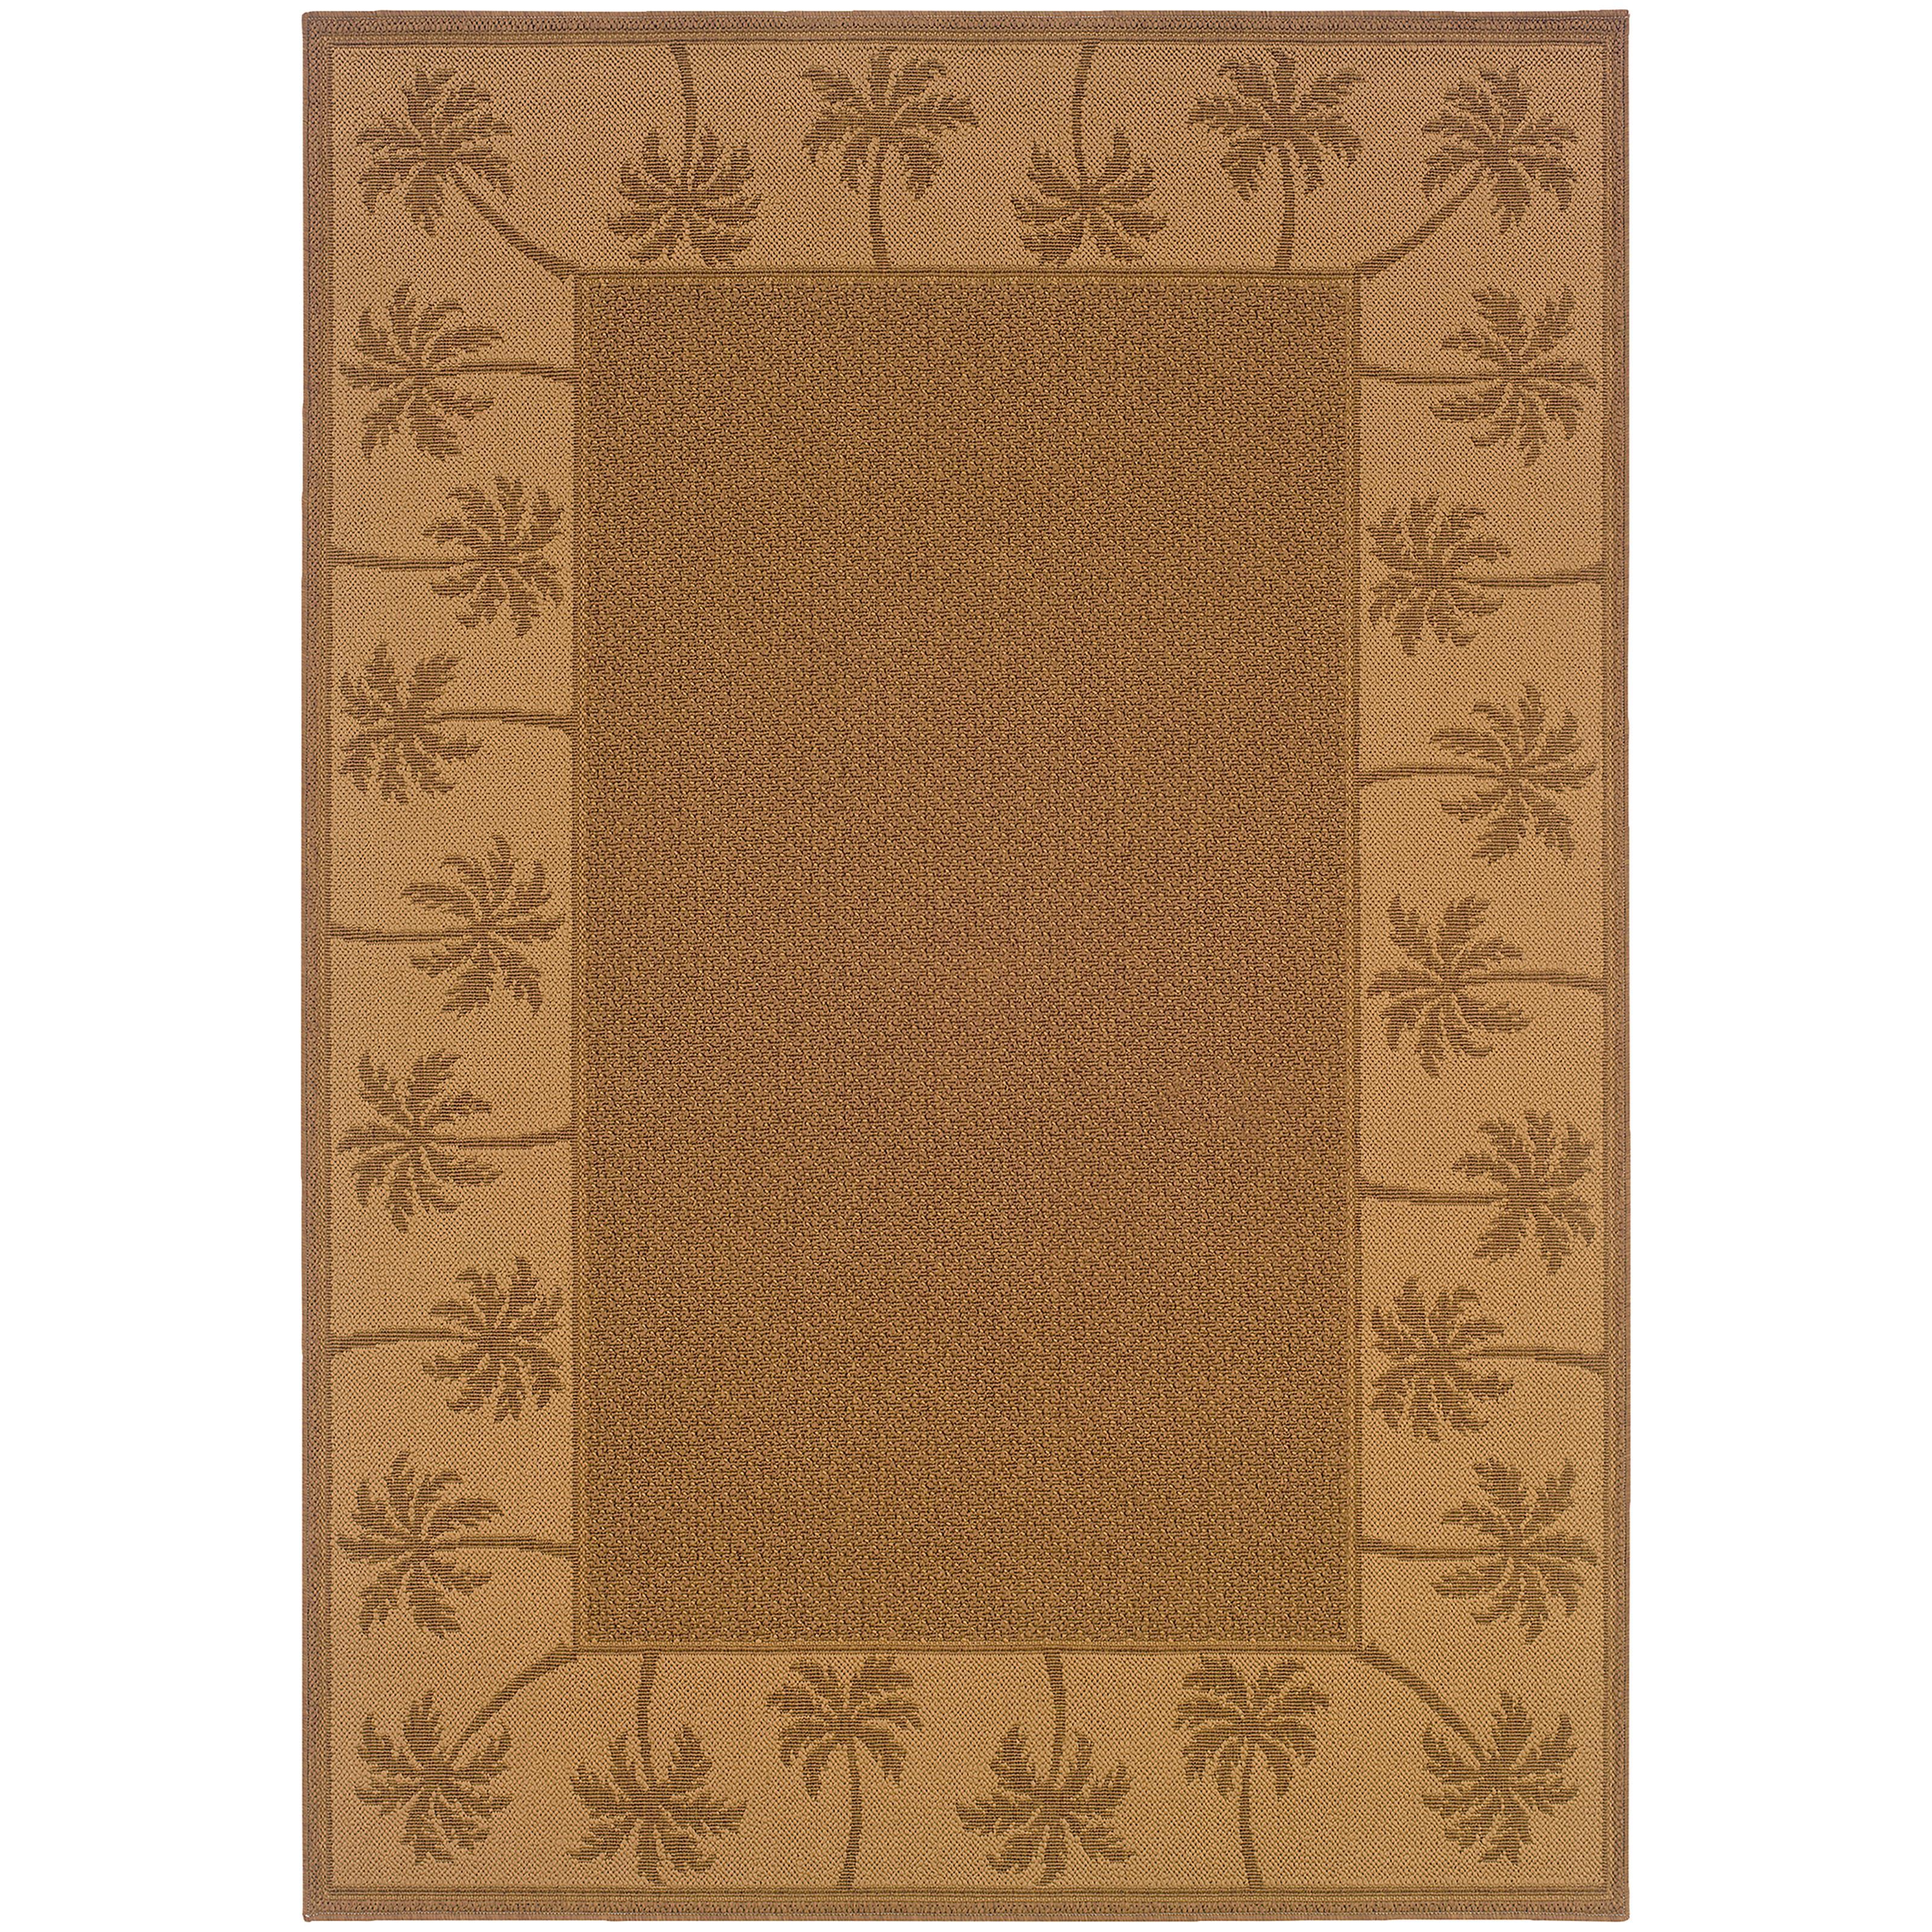 "Lanai 8' 6"" X 13' Rug by Oriental Weavers at Steger's Furniture"